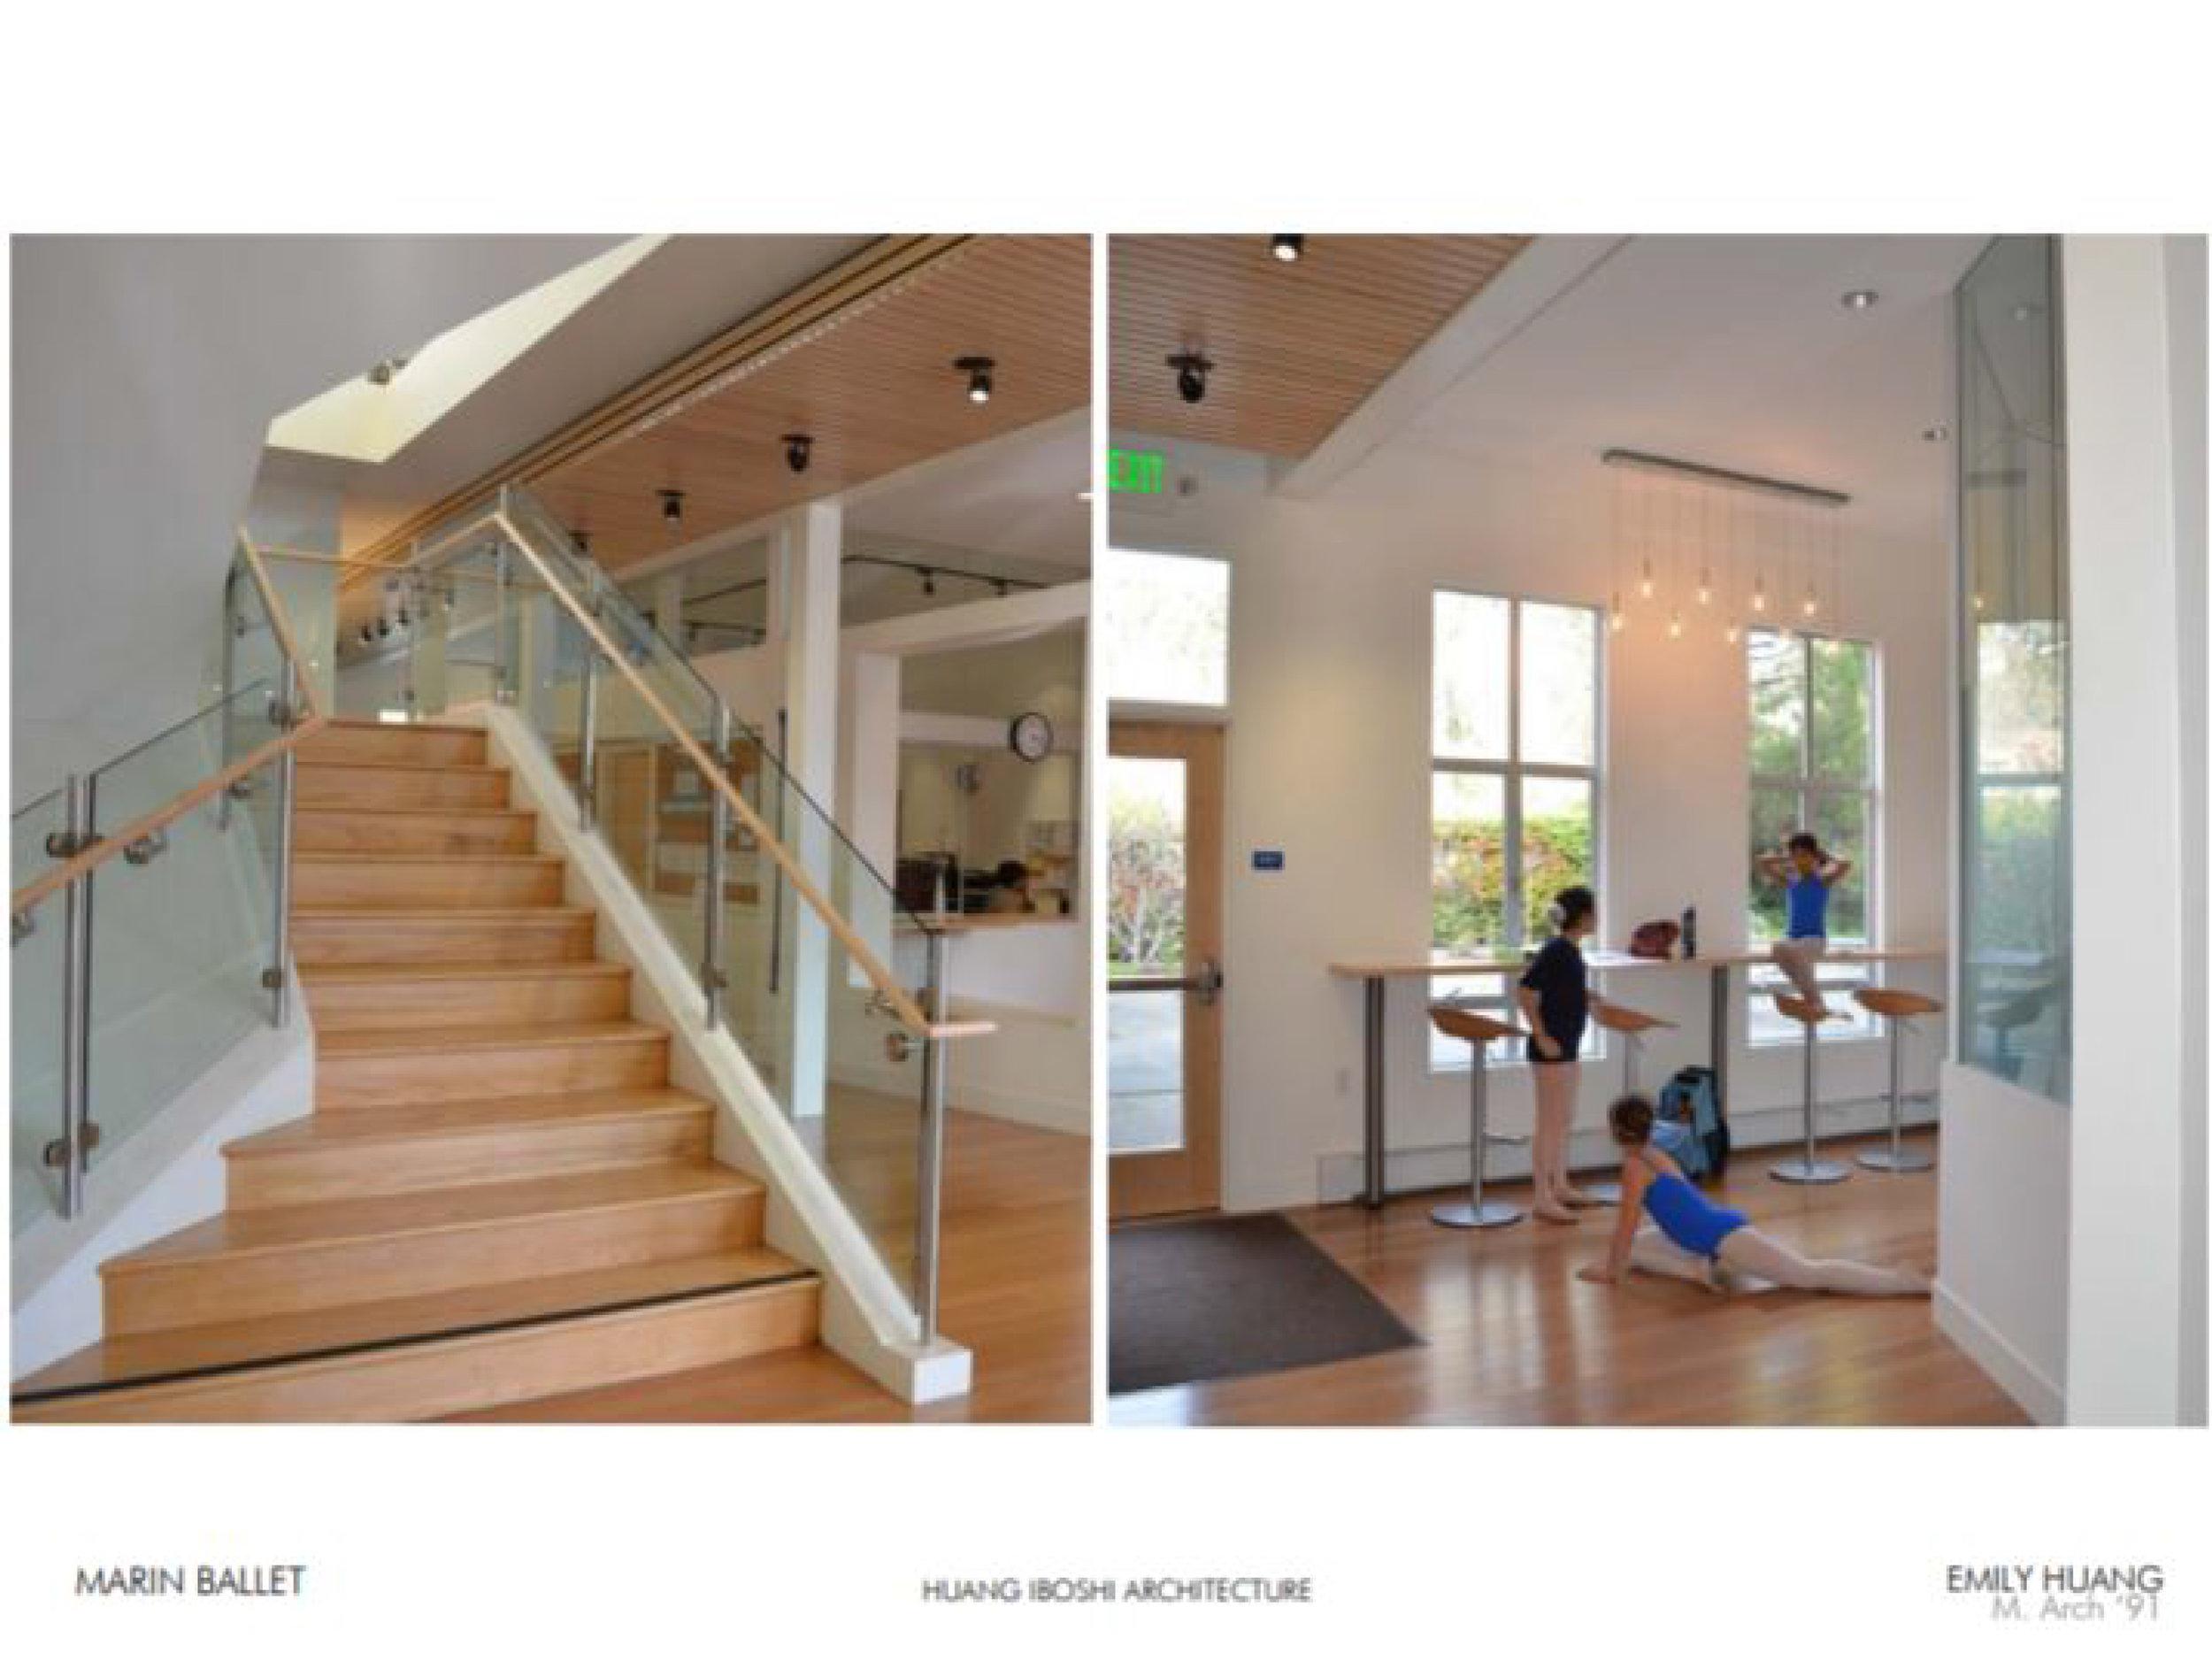 MIT ARCHITECTURE 150 SAN FRANCISCO SLIDESHOW-85 copy.jpg